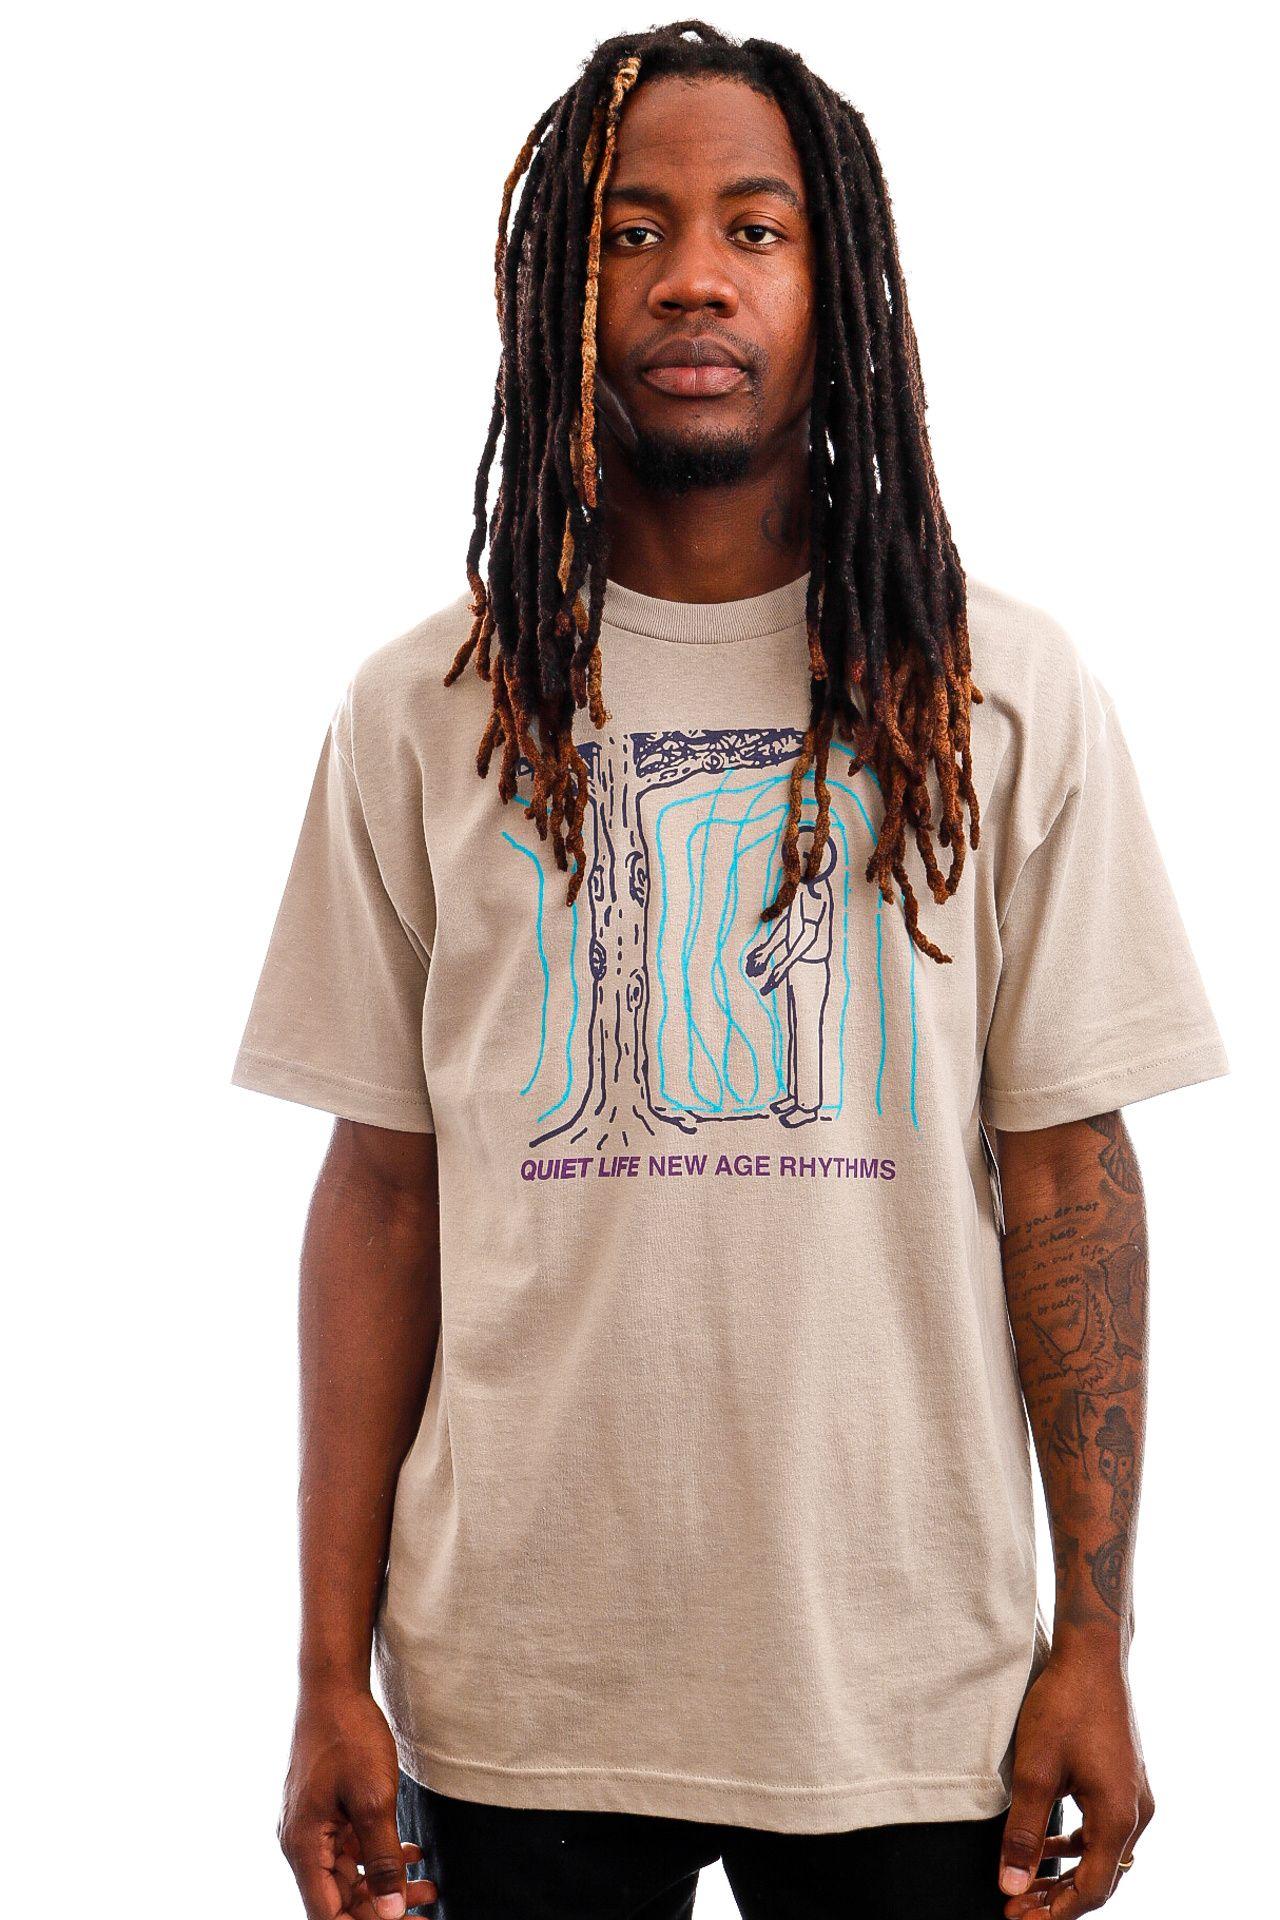 Afbeelding van The Quiet Life T-shirt New Age Rhythms Tee Sand QL-21SPD2-2129